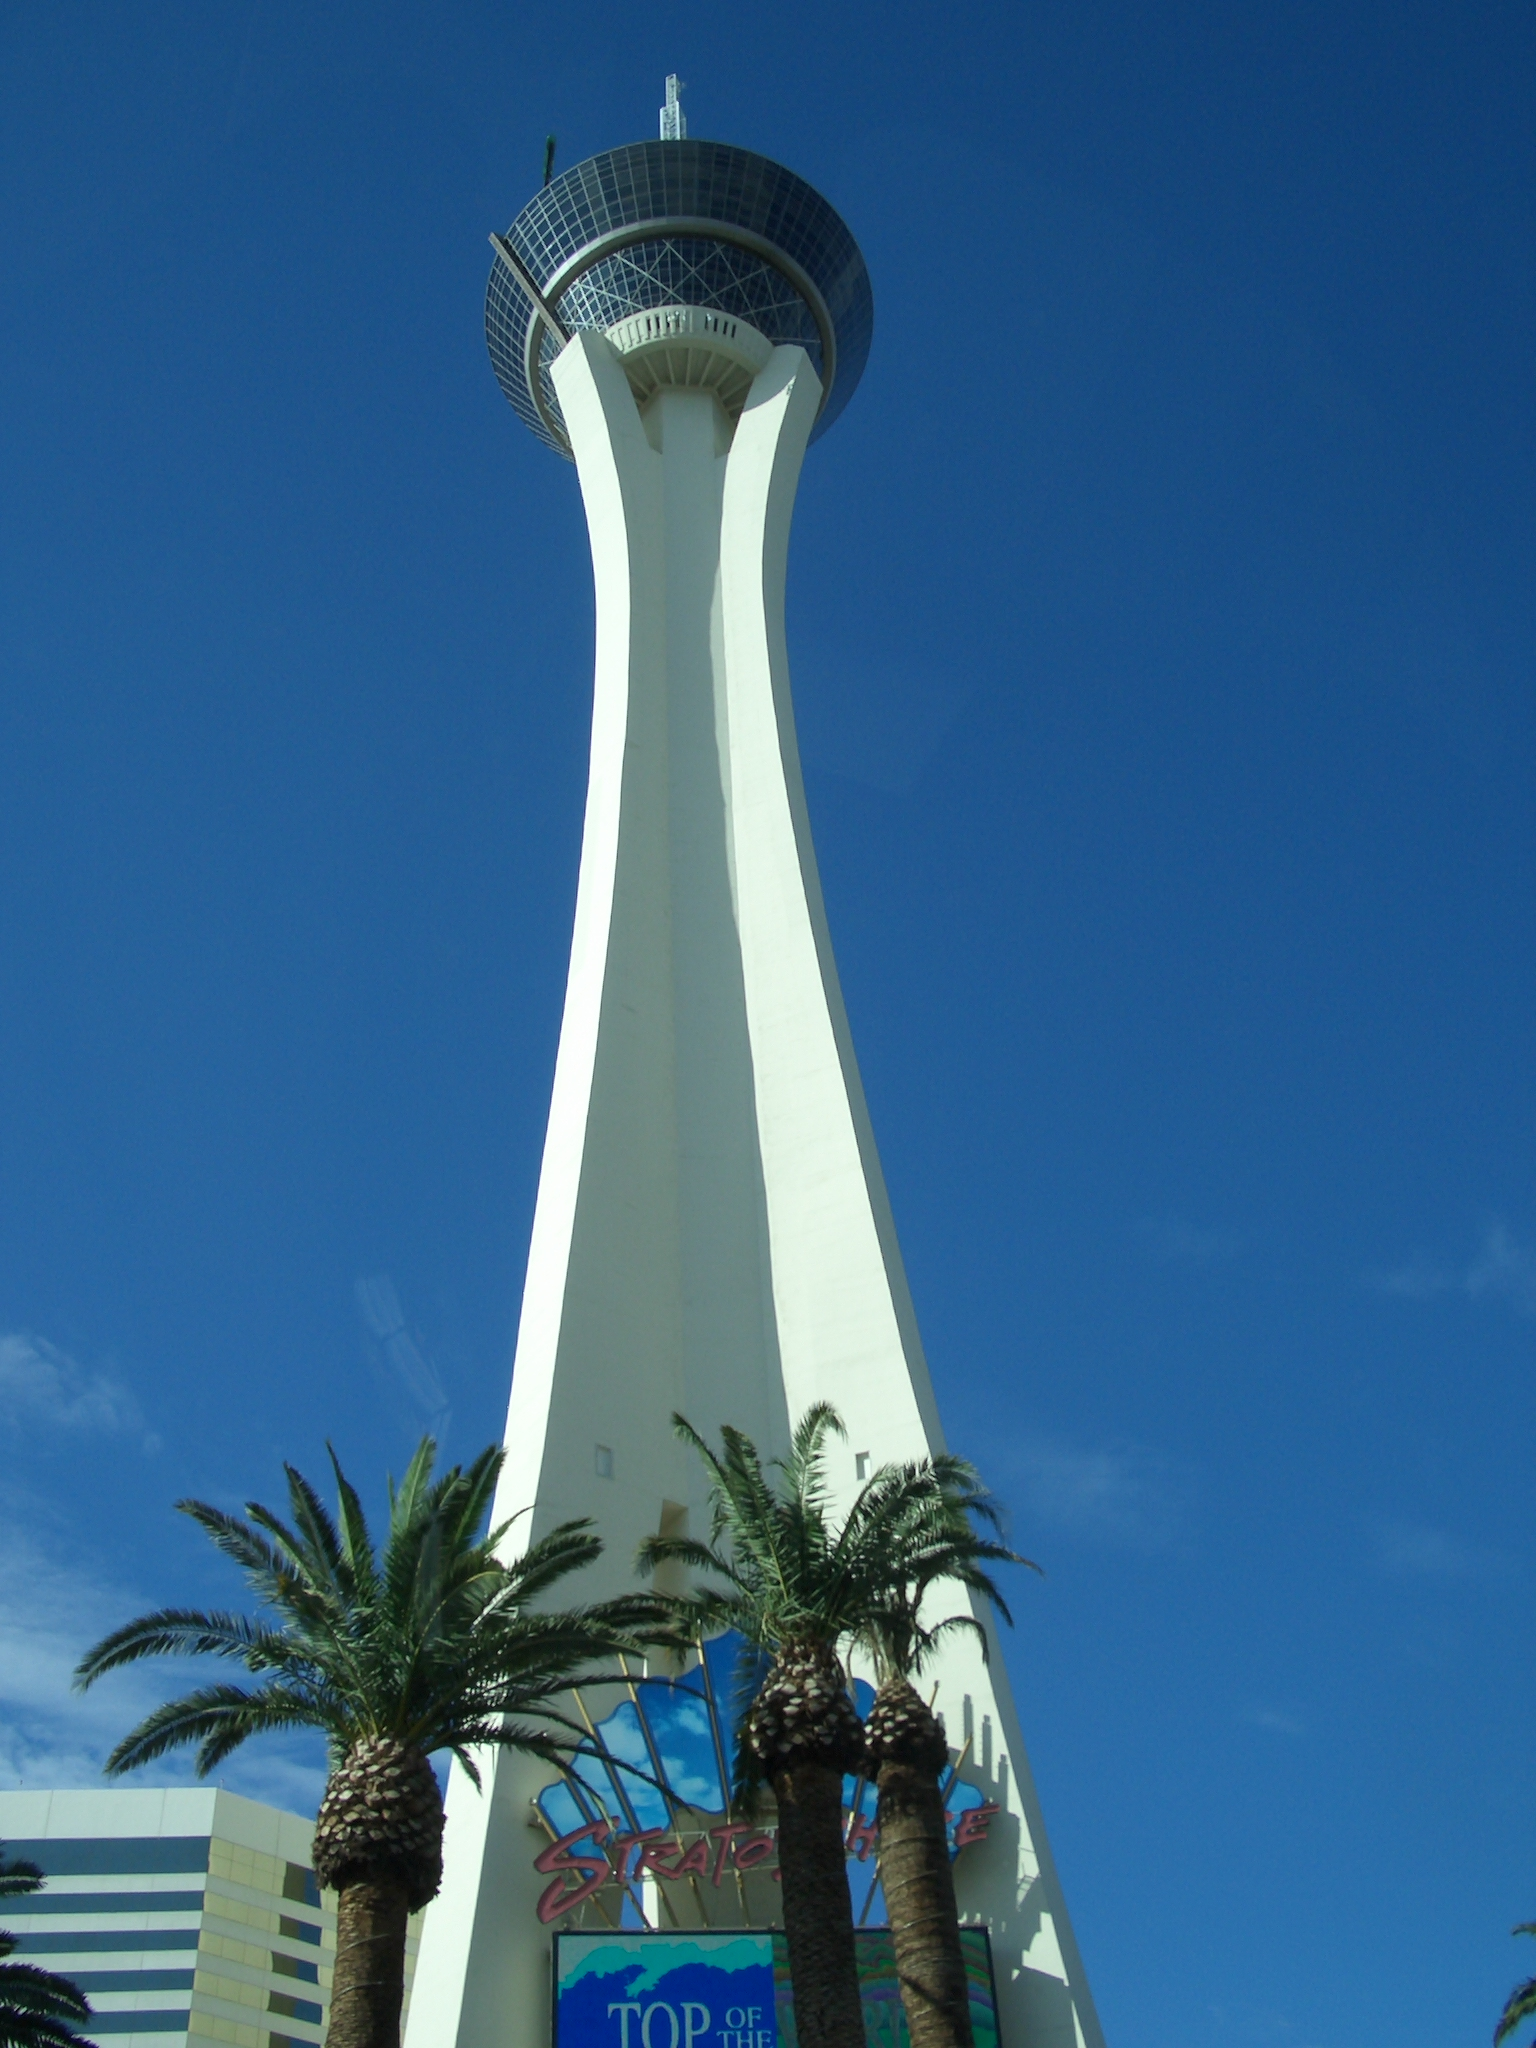 Top attractions in Las vegas